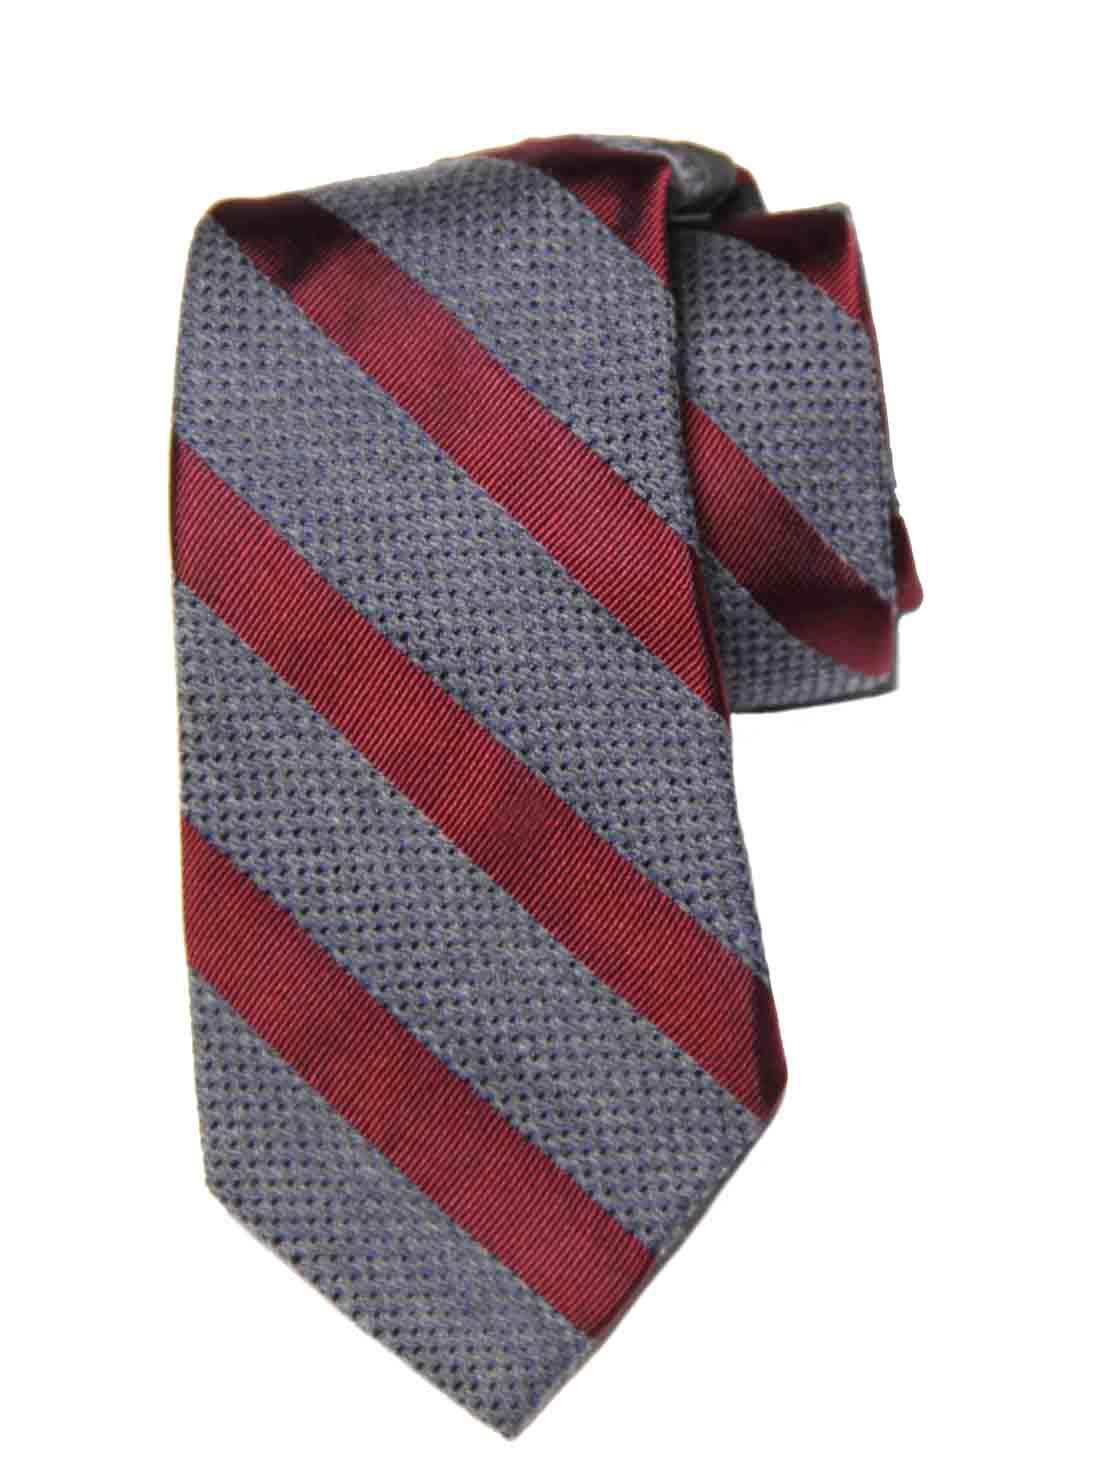 Tasso Elba Teramo Stripe Tie Red Gray Silk Wool Cotton Striped Men's